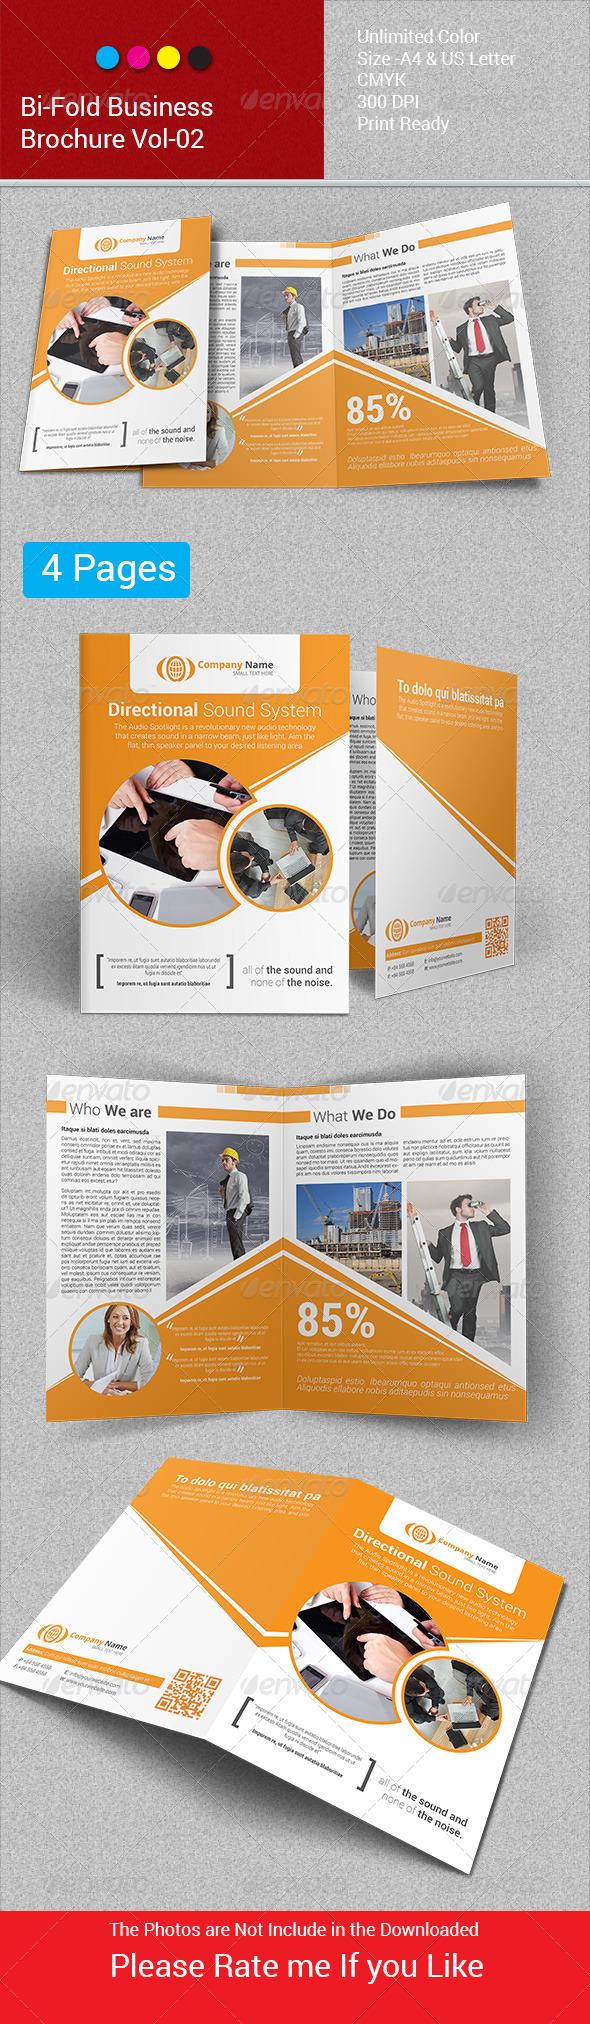 Bi-Fold Business Brochure Vol-02 - Corporate Flyers